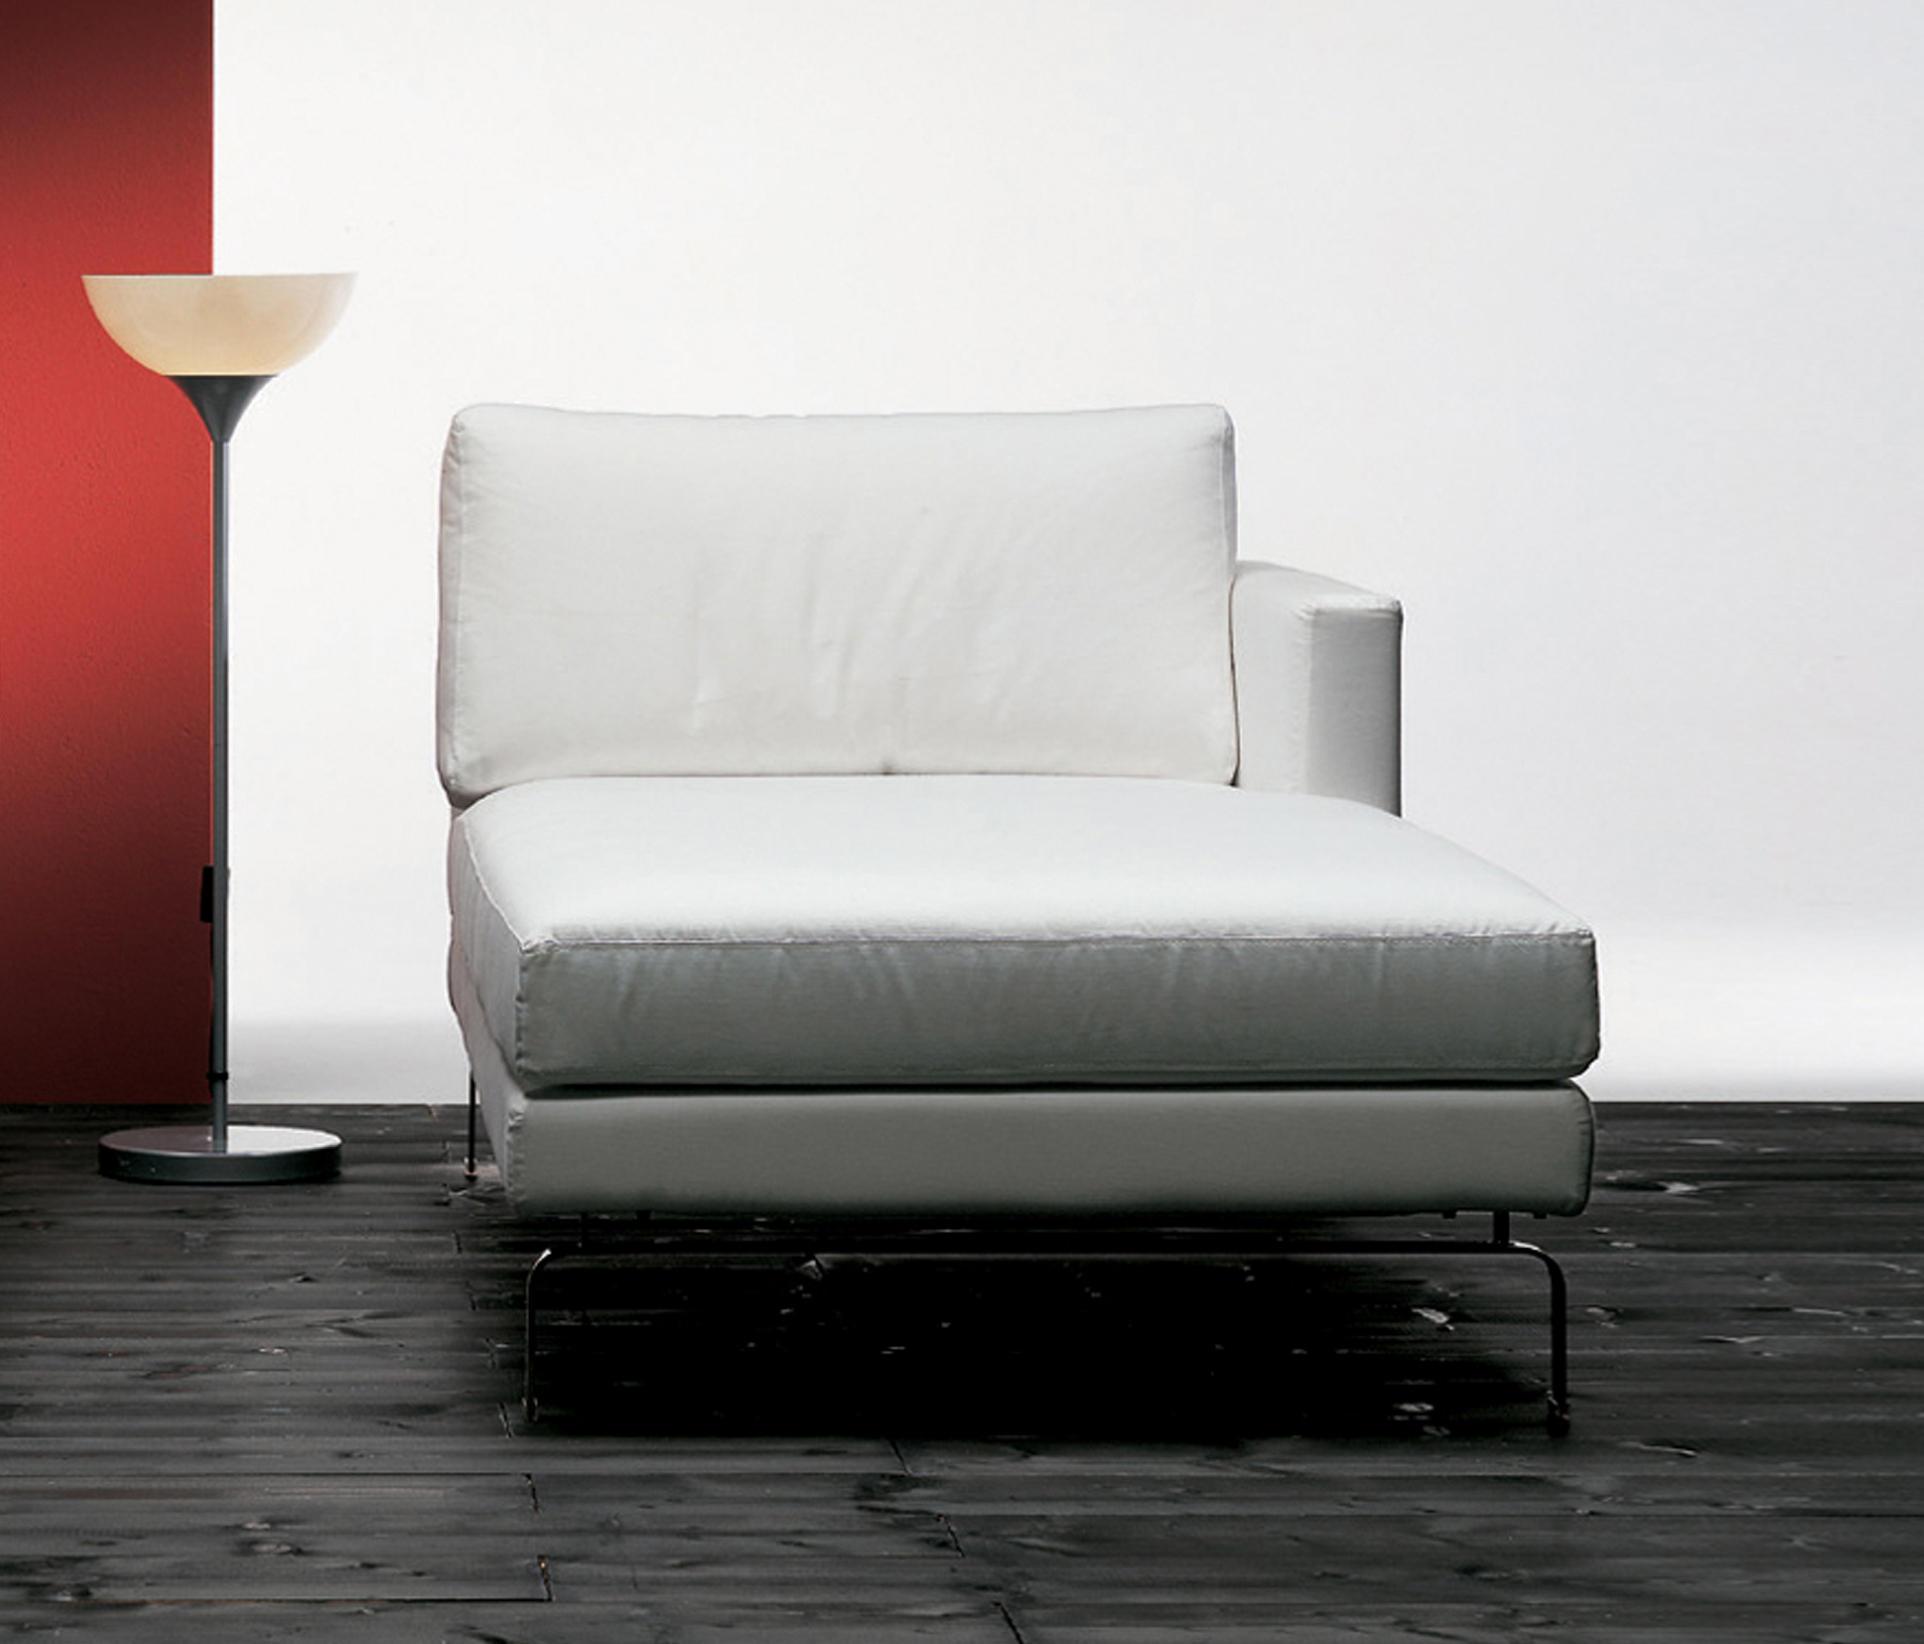 Mizar chaise longue chaise longues from via della spiga for Chaise longue manufacturers